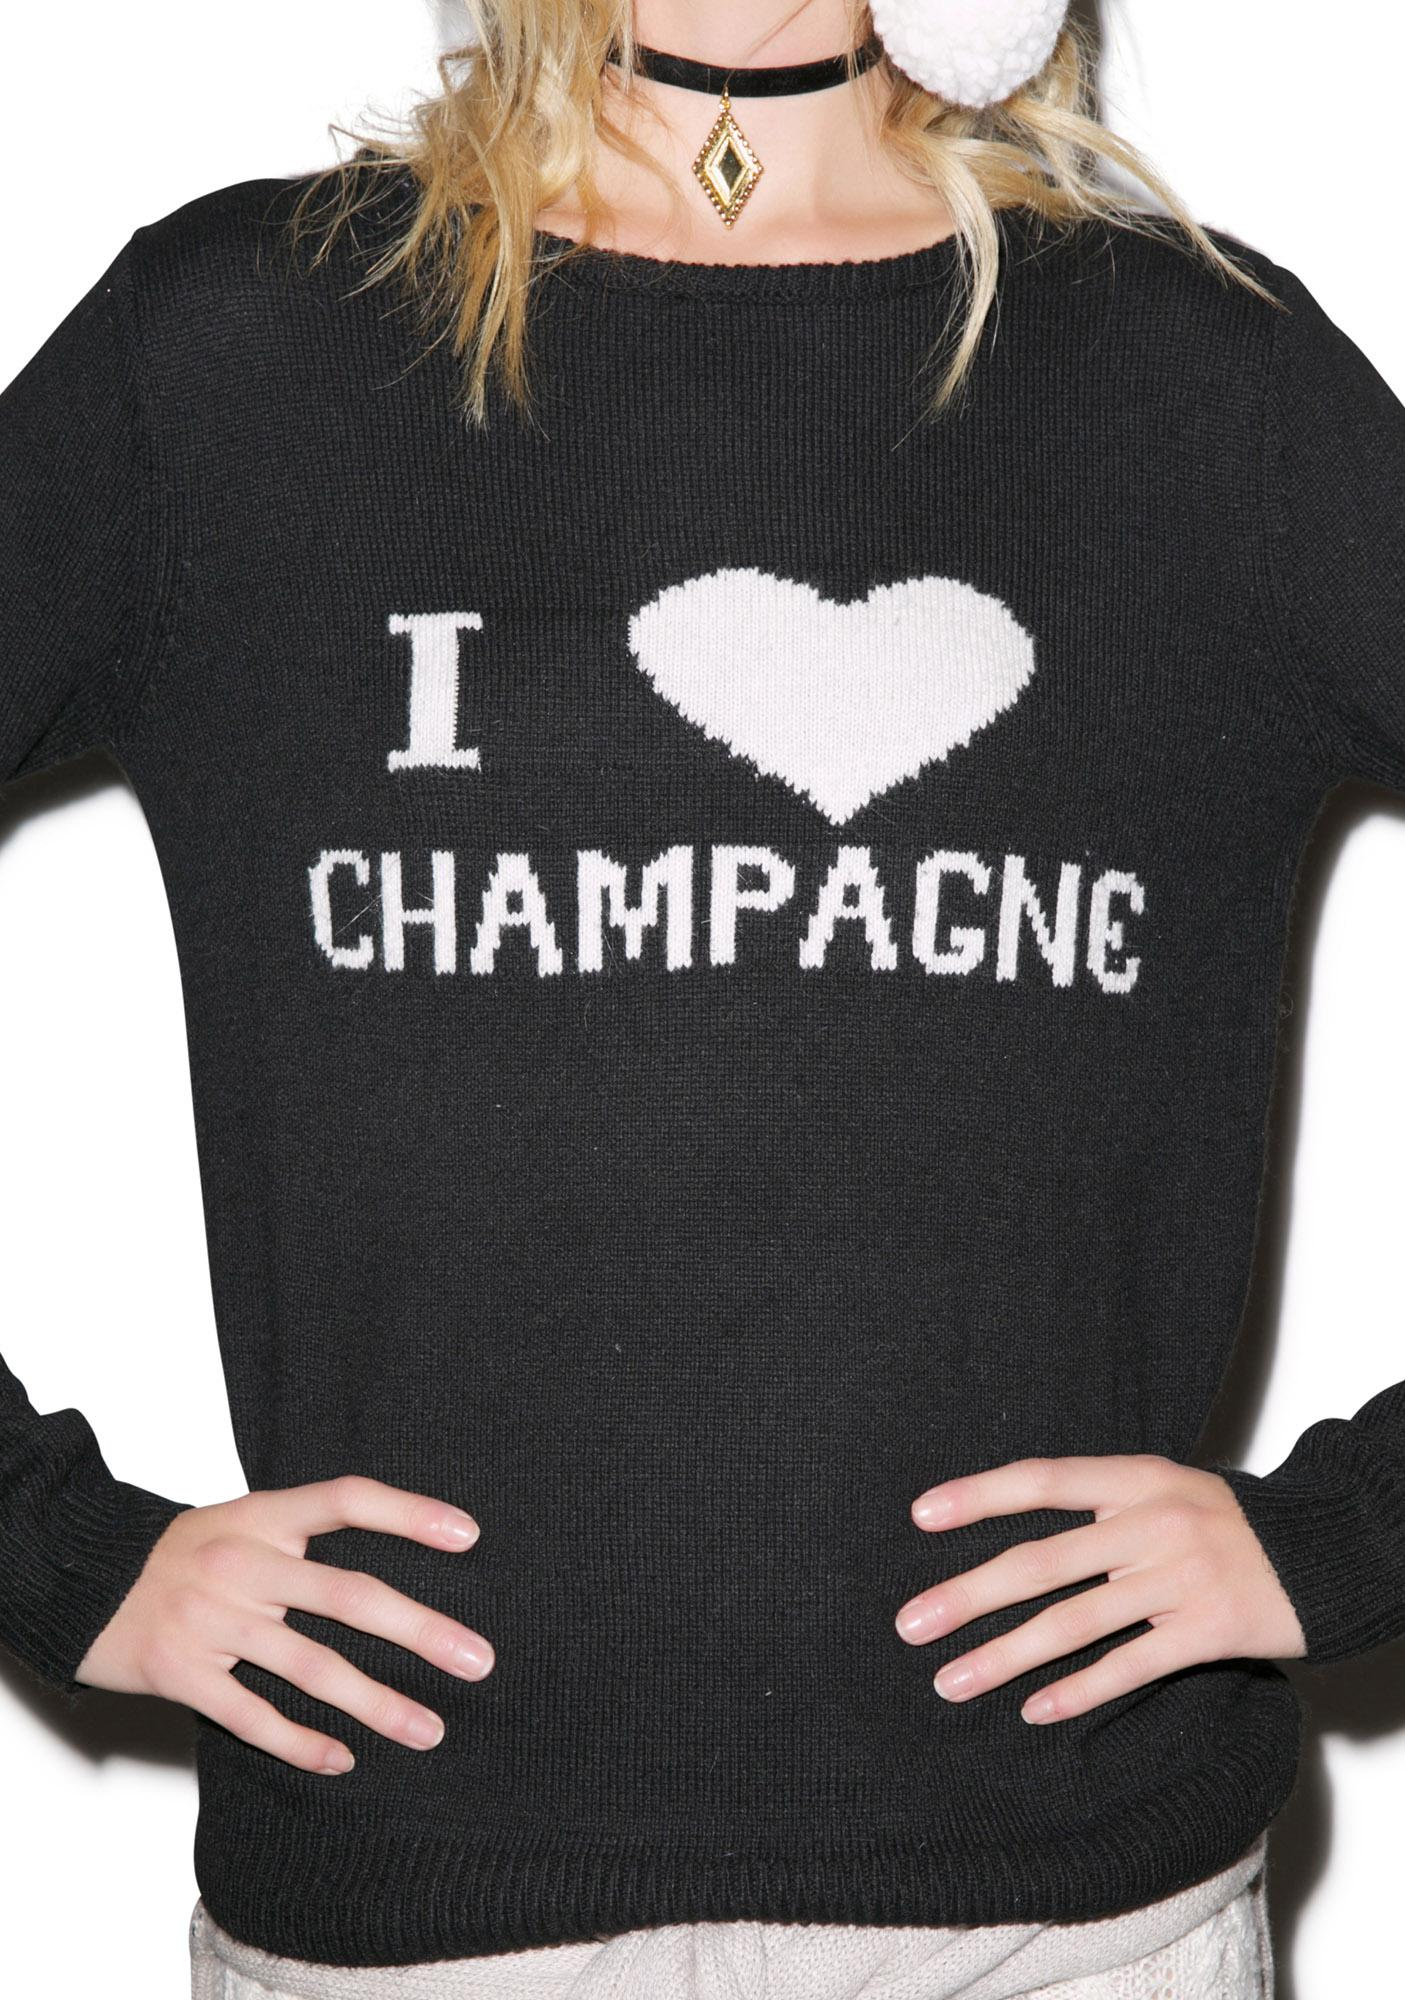 For Love & Lemons Champagne Sweater